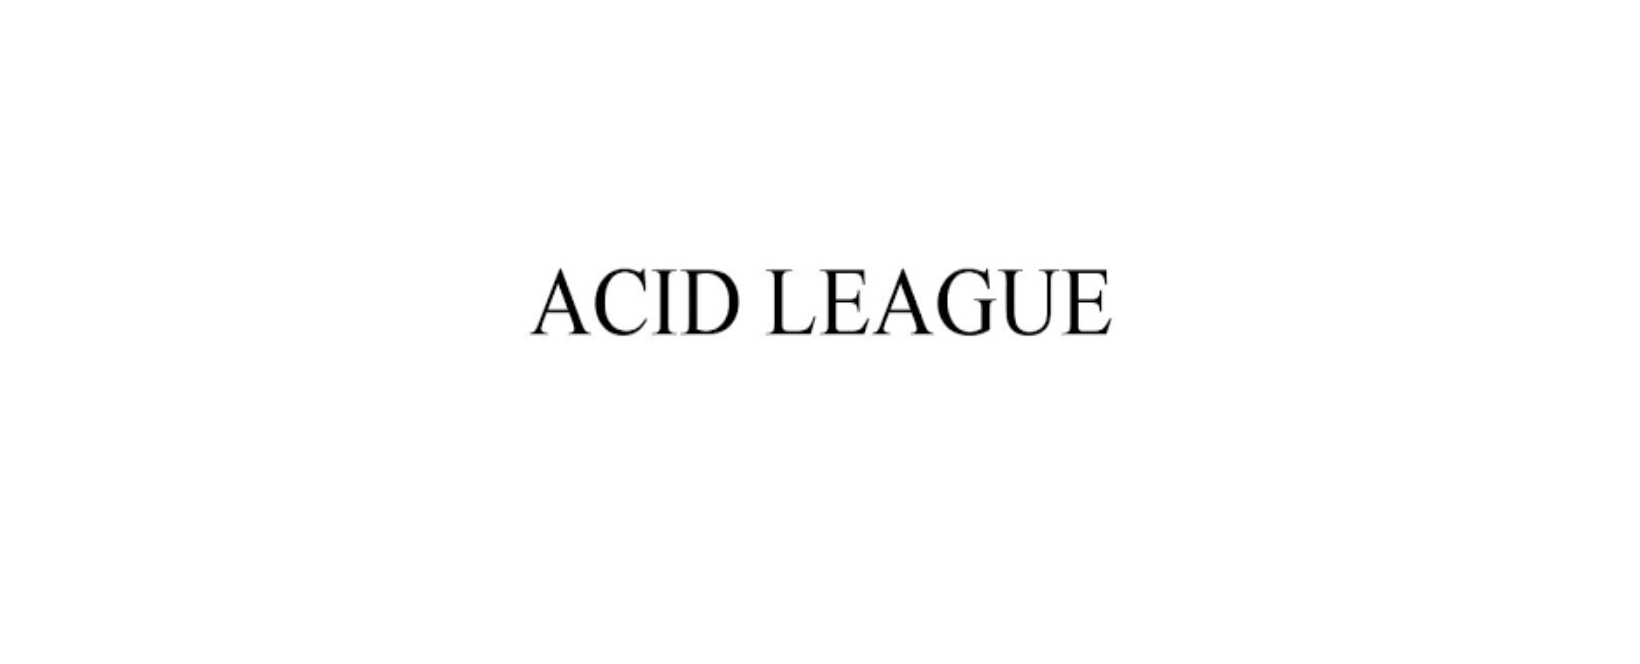 Acid League Discount Code 2021